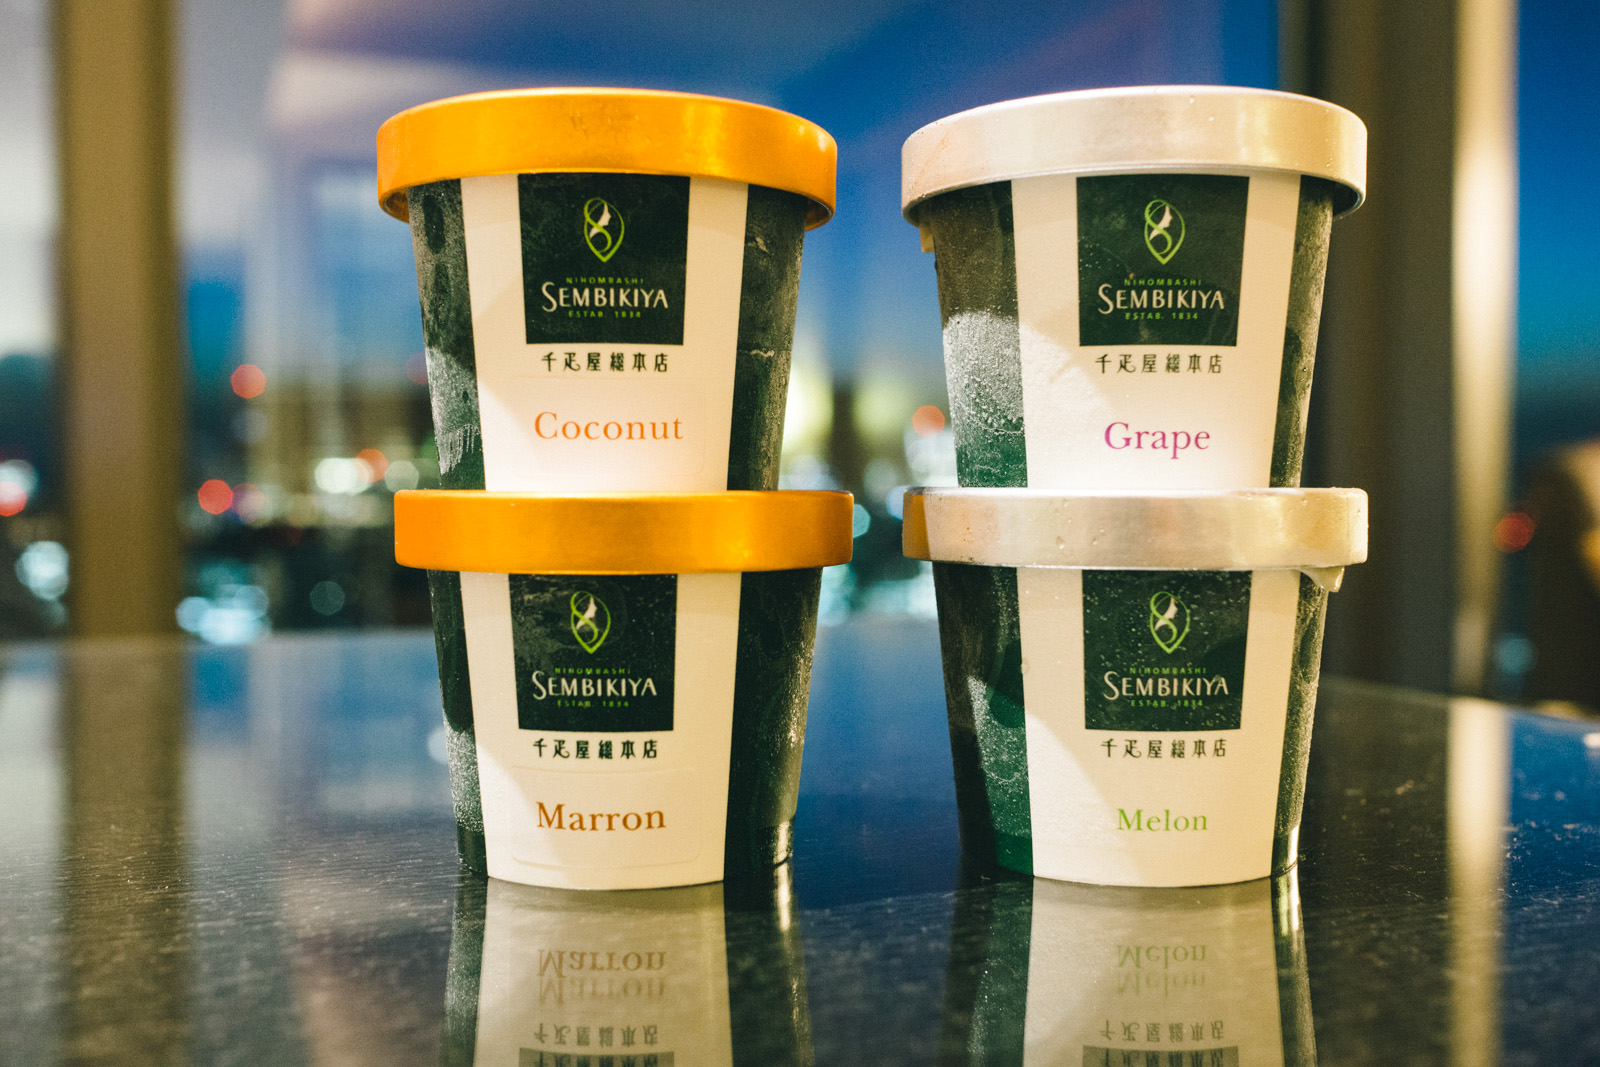 that-food-cray-fruit-parlor-tokyo-japan-semiyaka-ice-cream-2